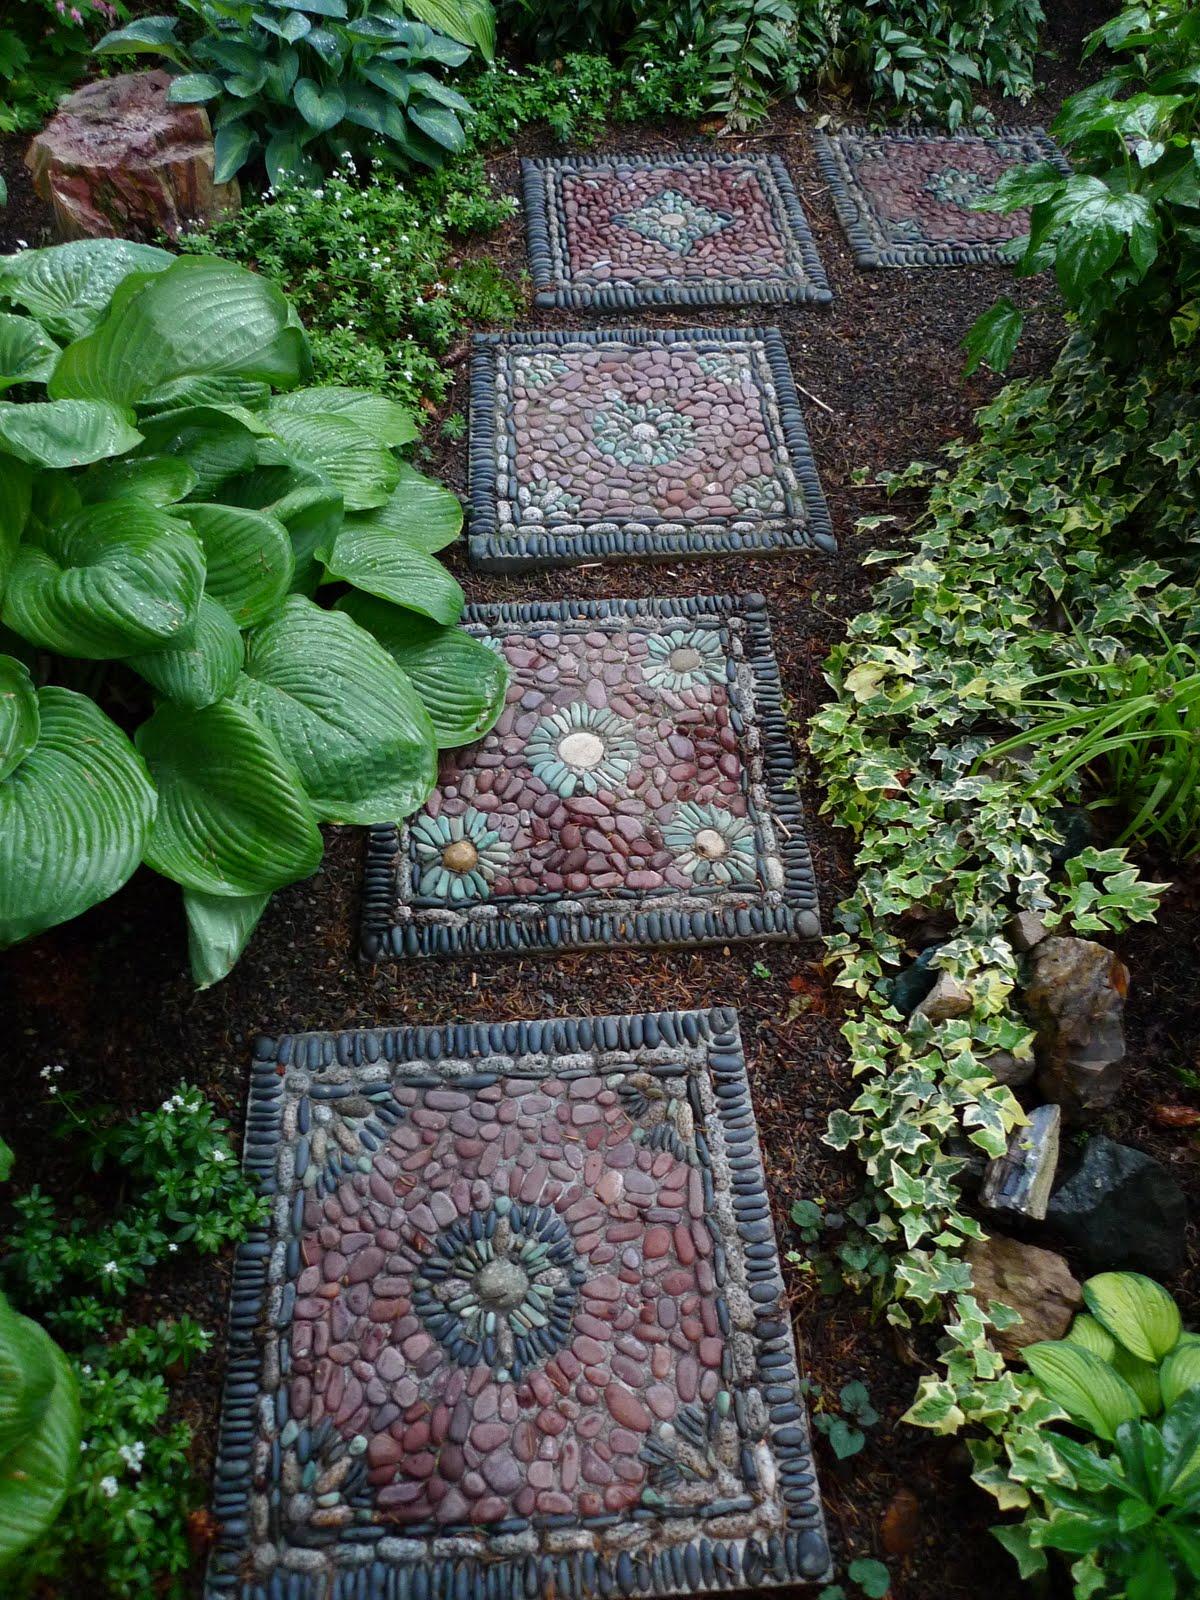 30 Beautiful DIY Stepping Stone Ideas to Decorate Garden on Backyard Pebble Ideas id=69185